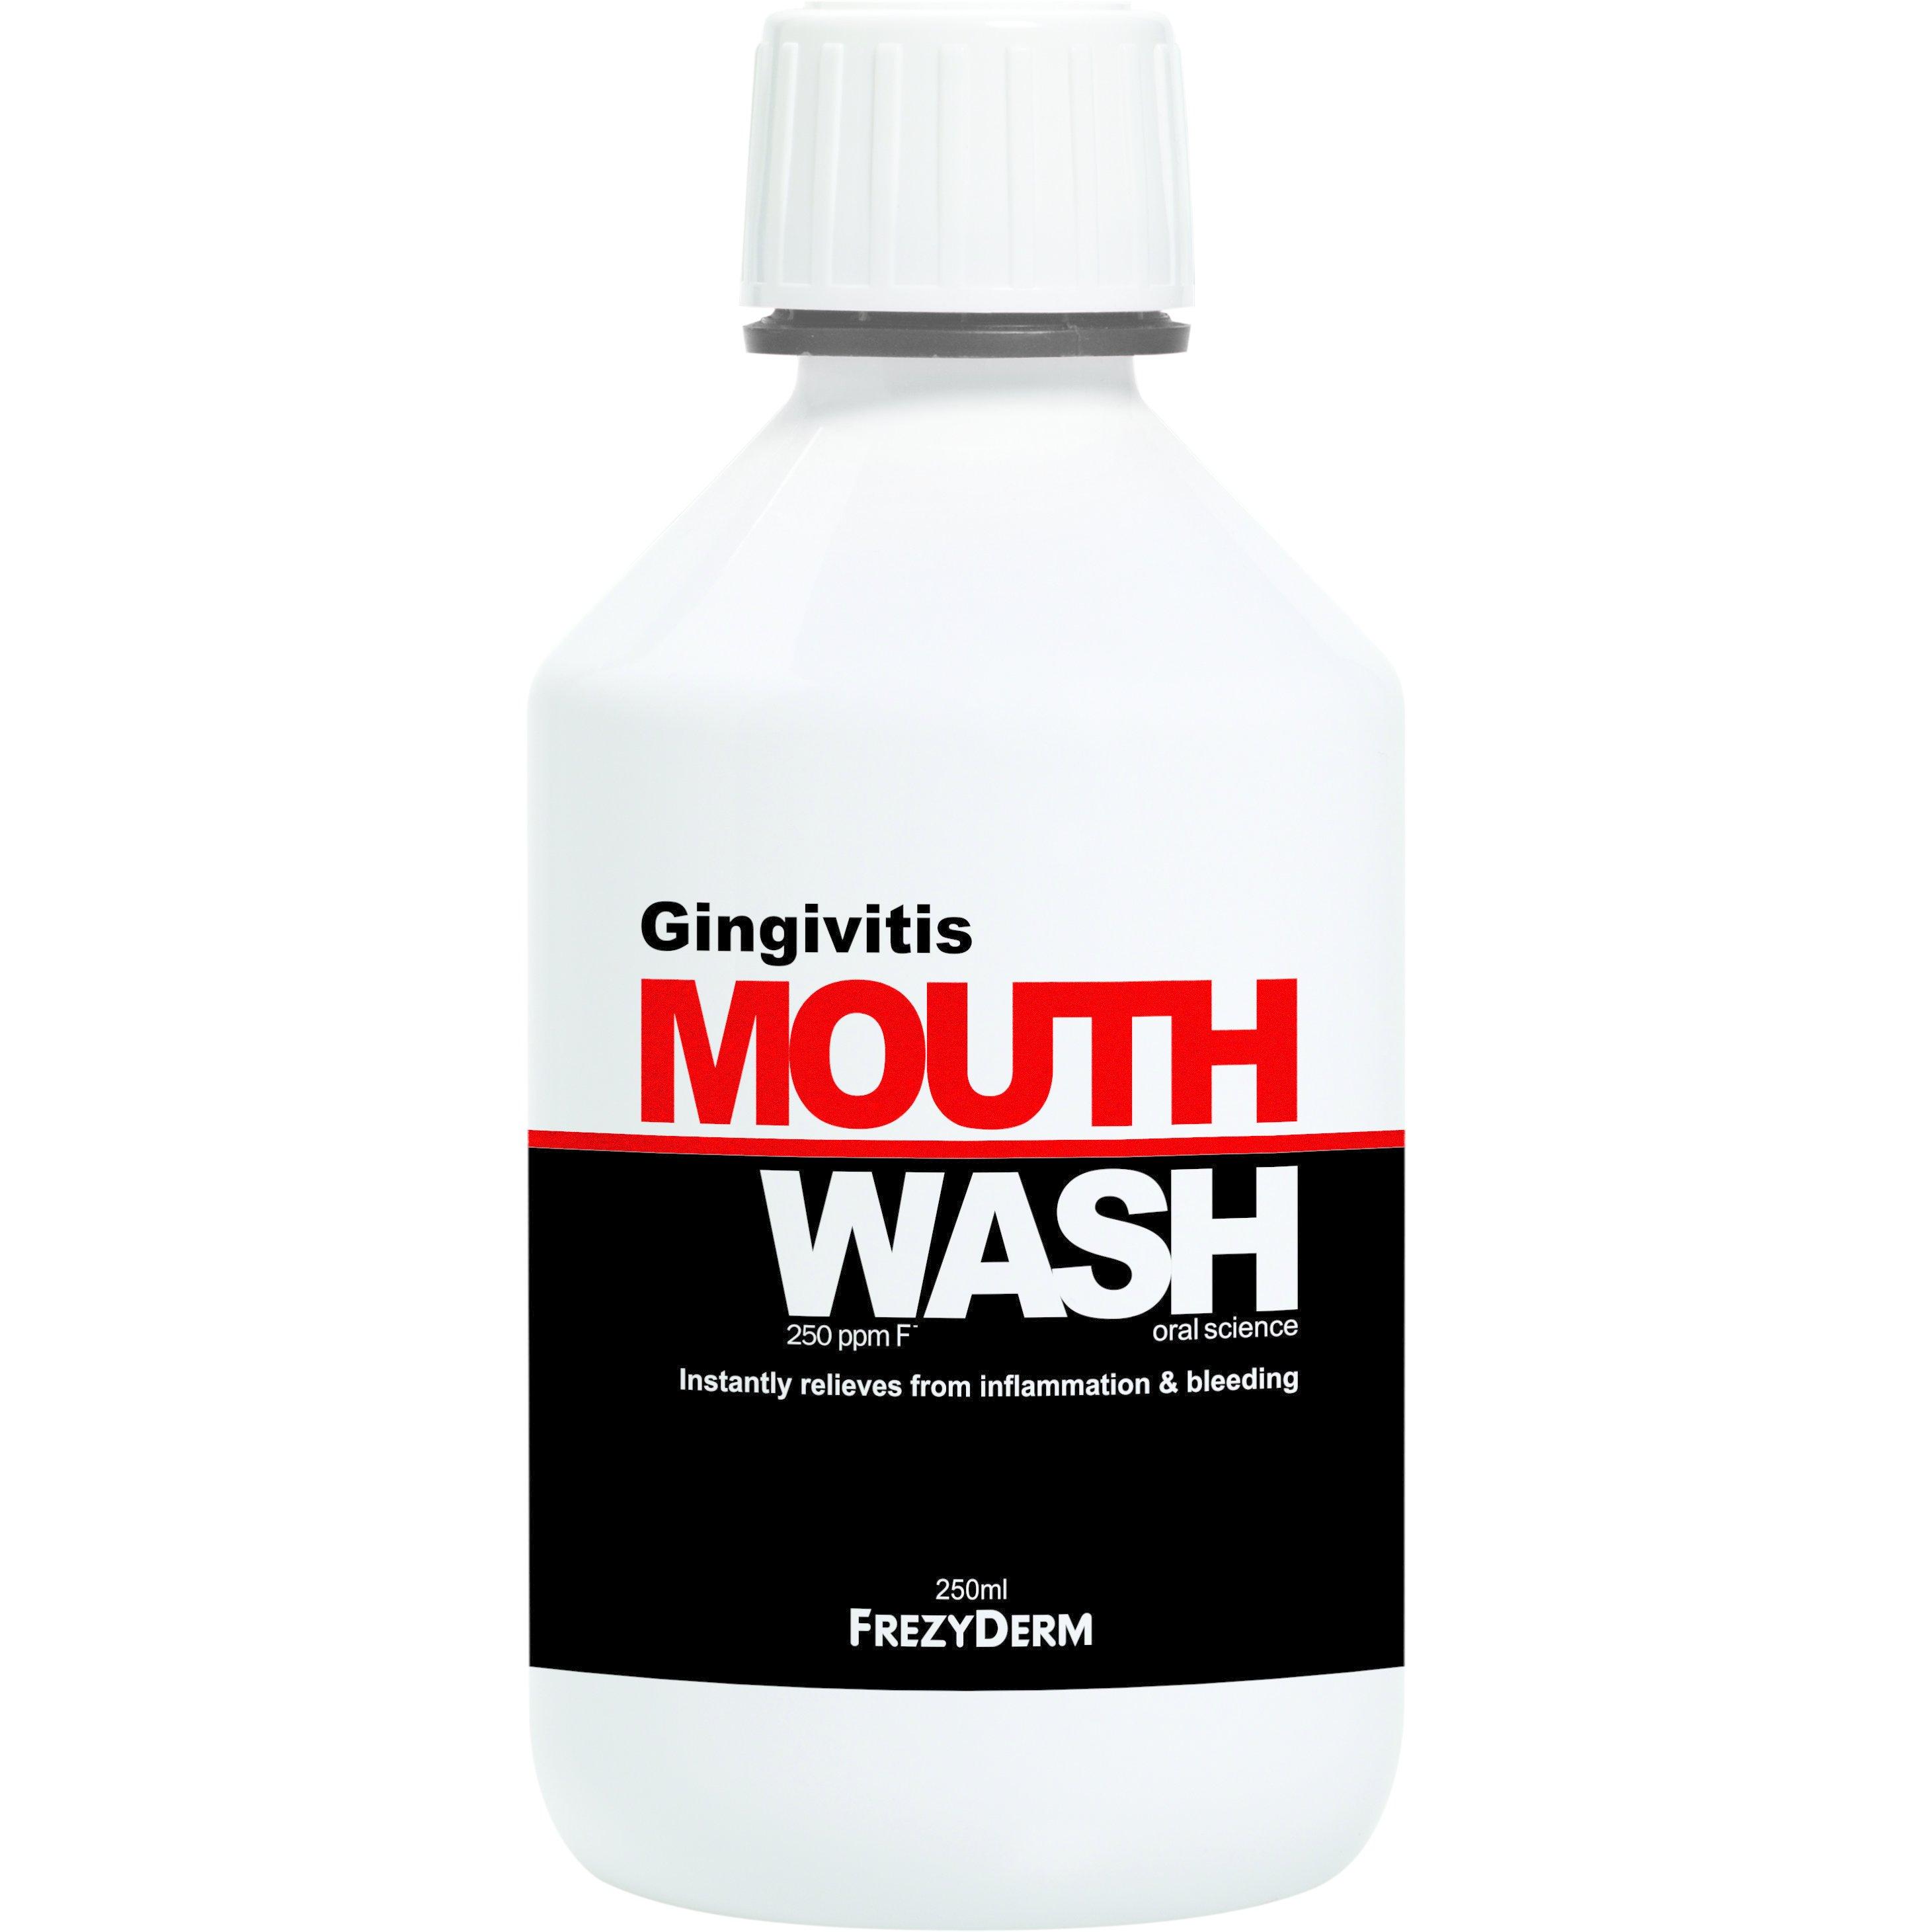 Frezyderm Gingivitis Mouthwash Φθοριούχο Στοματικό Διάλυμα Κατά της Ουλίτιδας 250ml